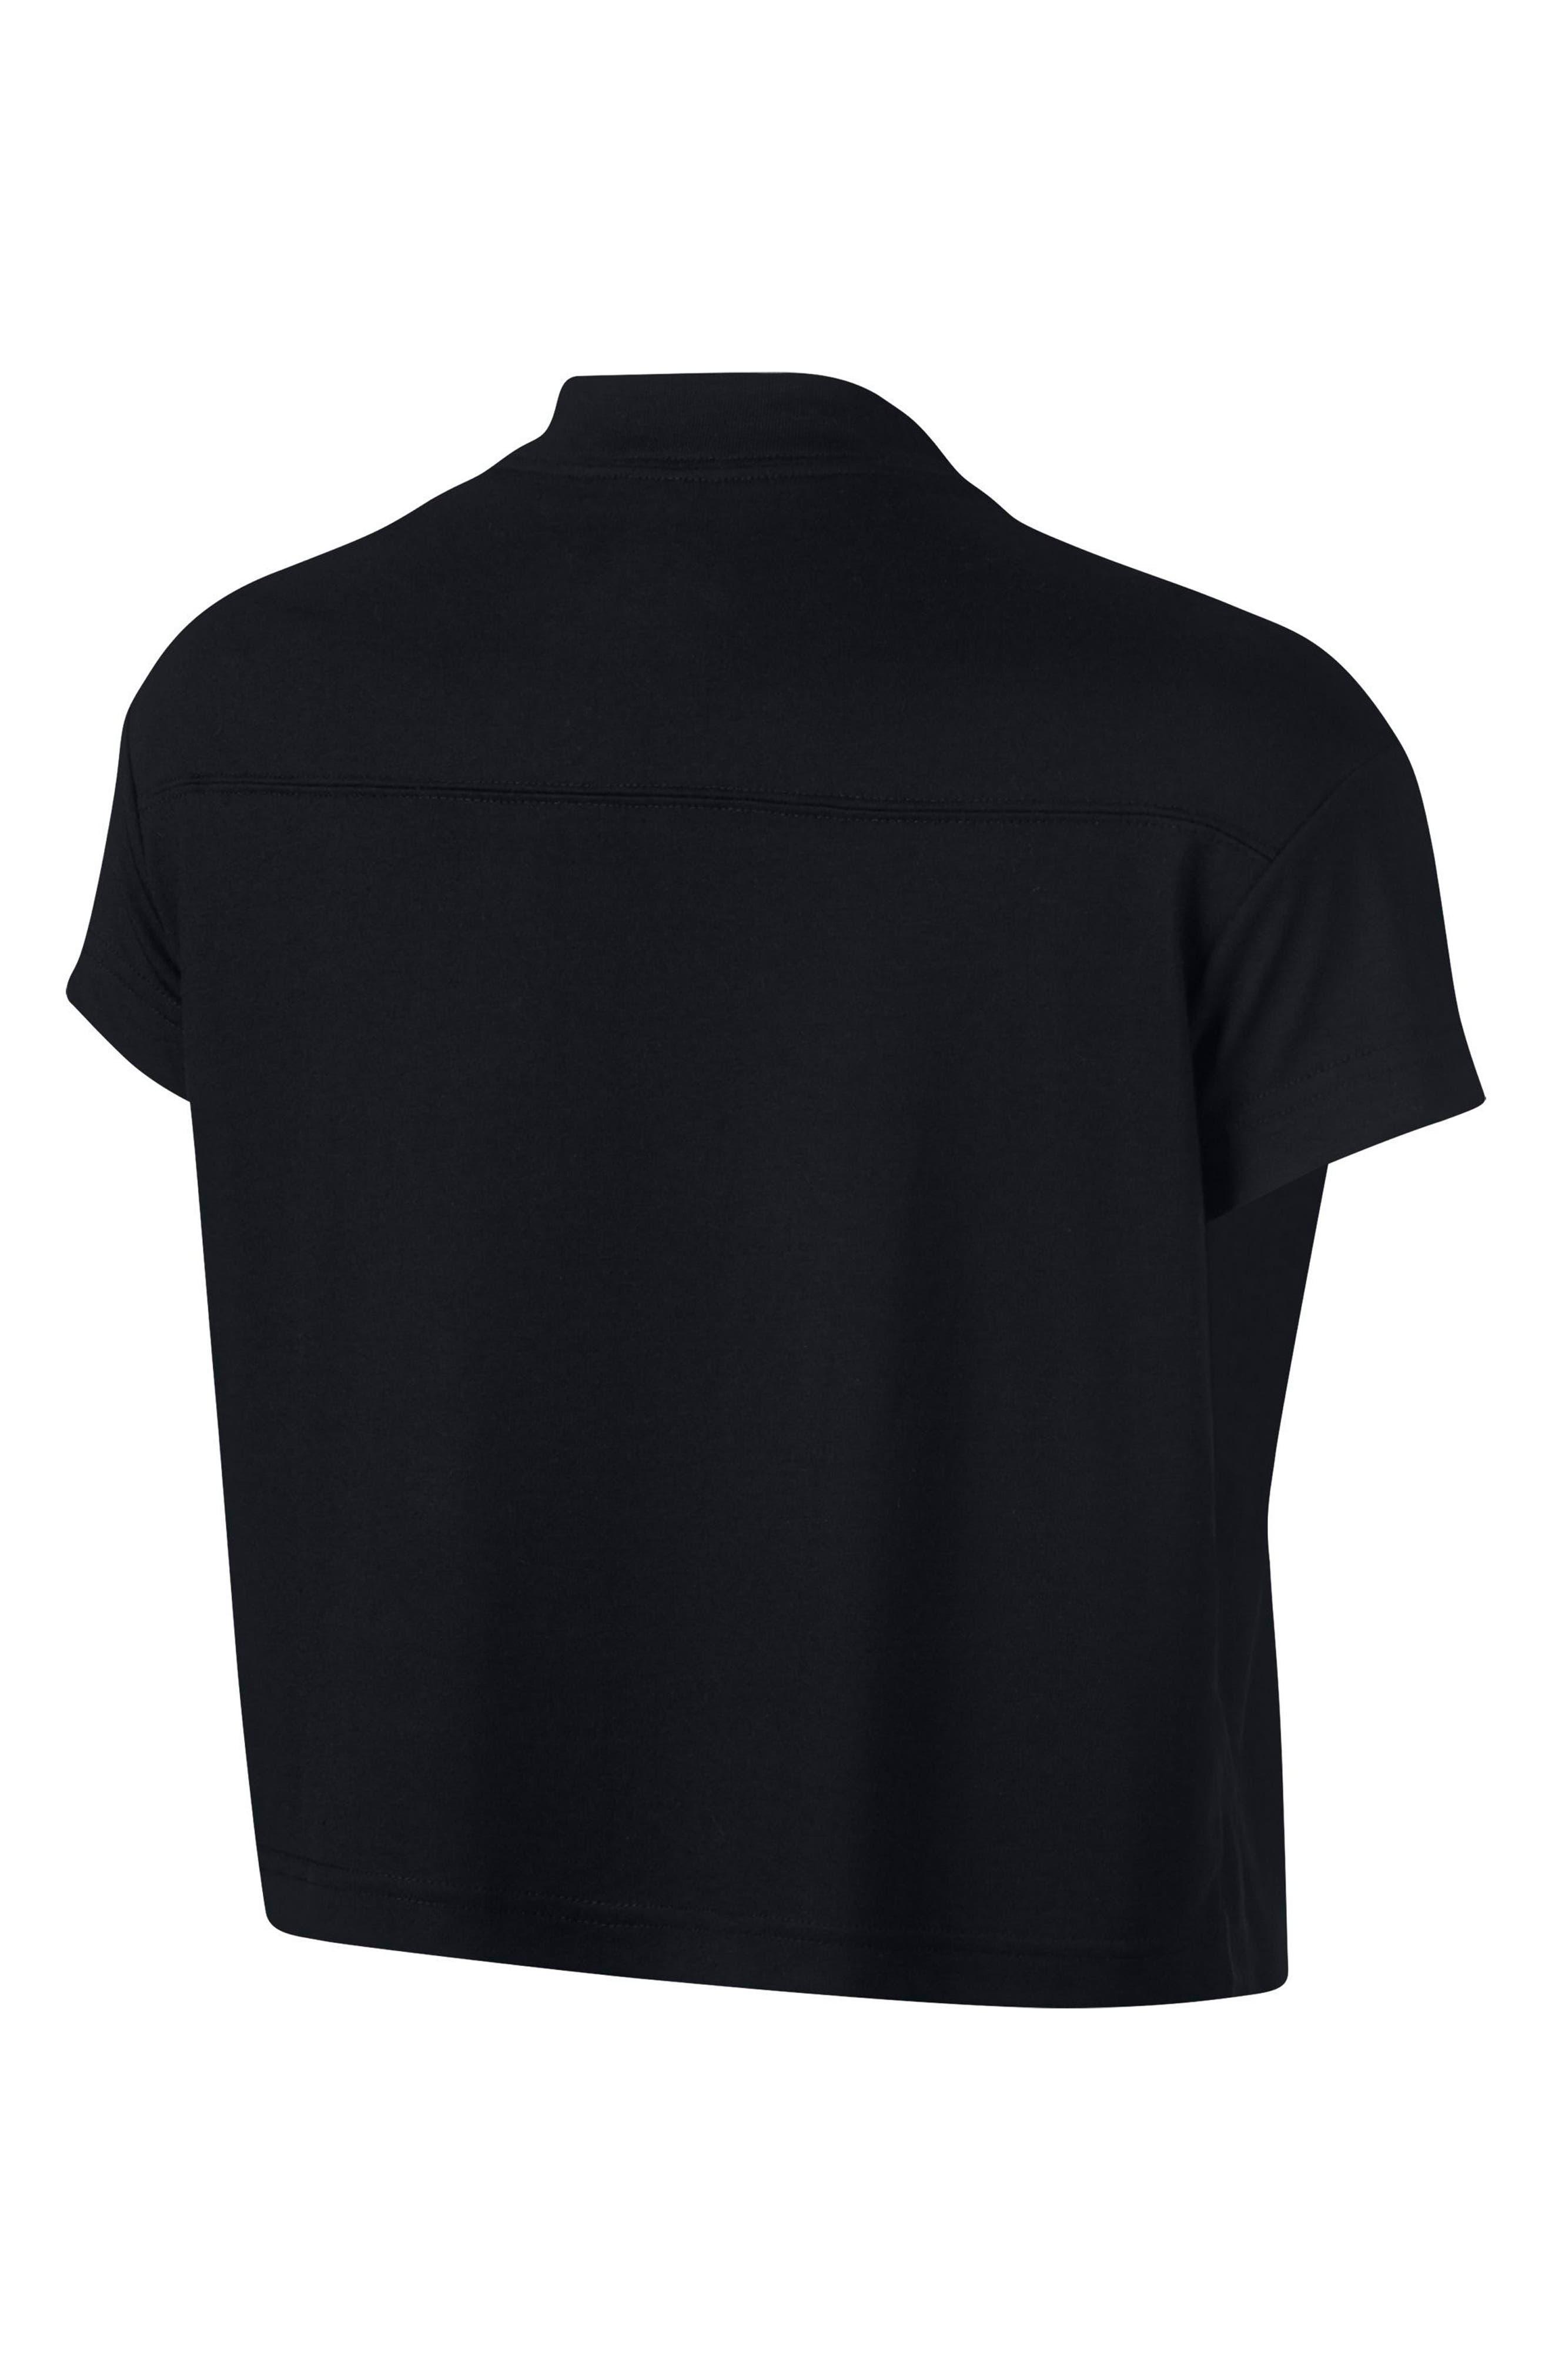 Sportswear Short Sleeve Crop Tee,                             Alternate thumbnail 2, color,                             010